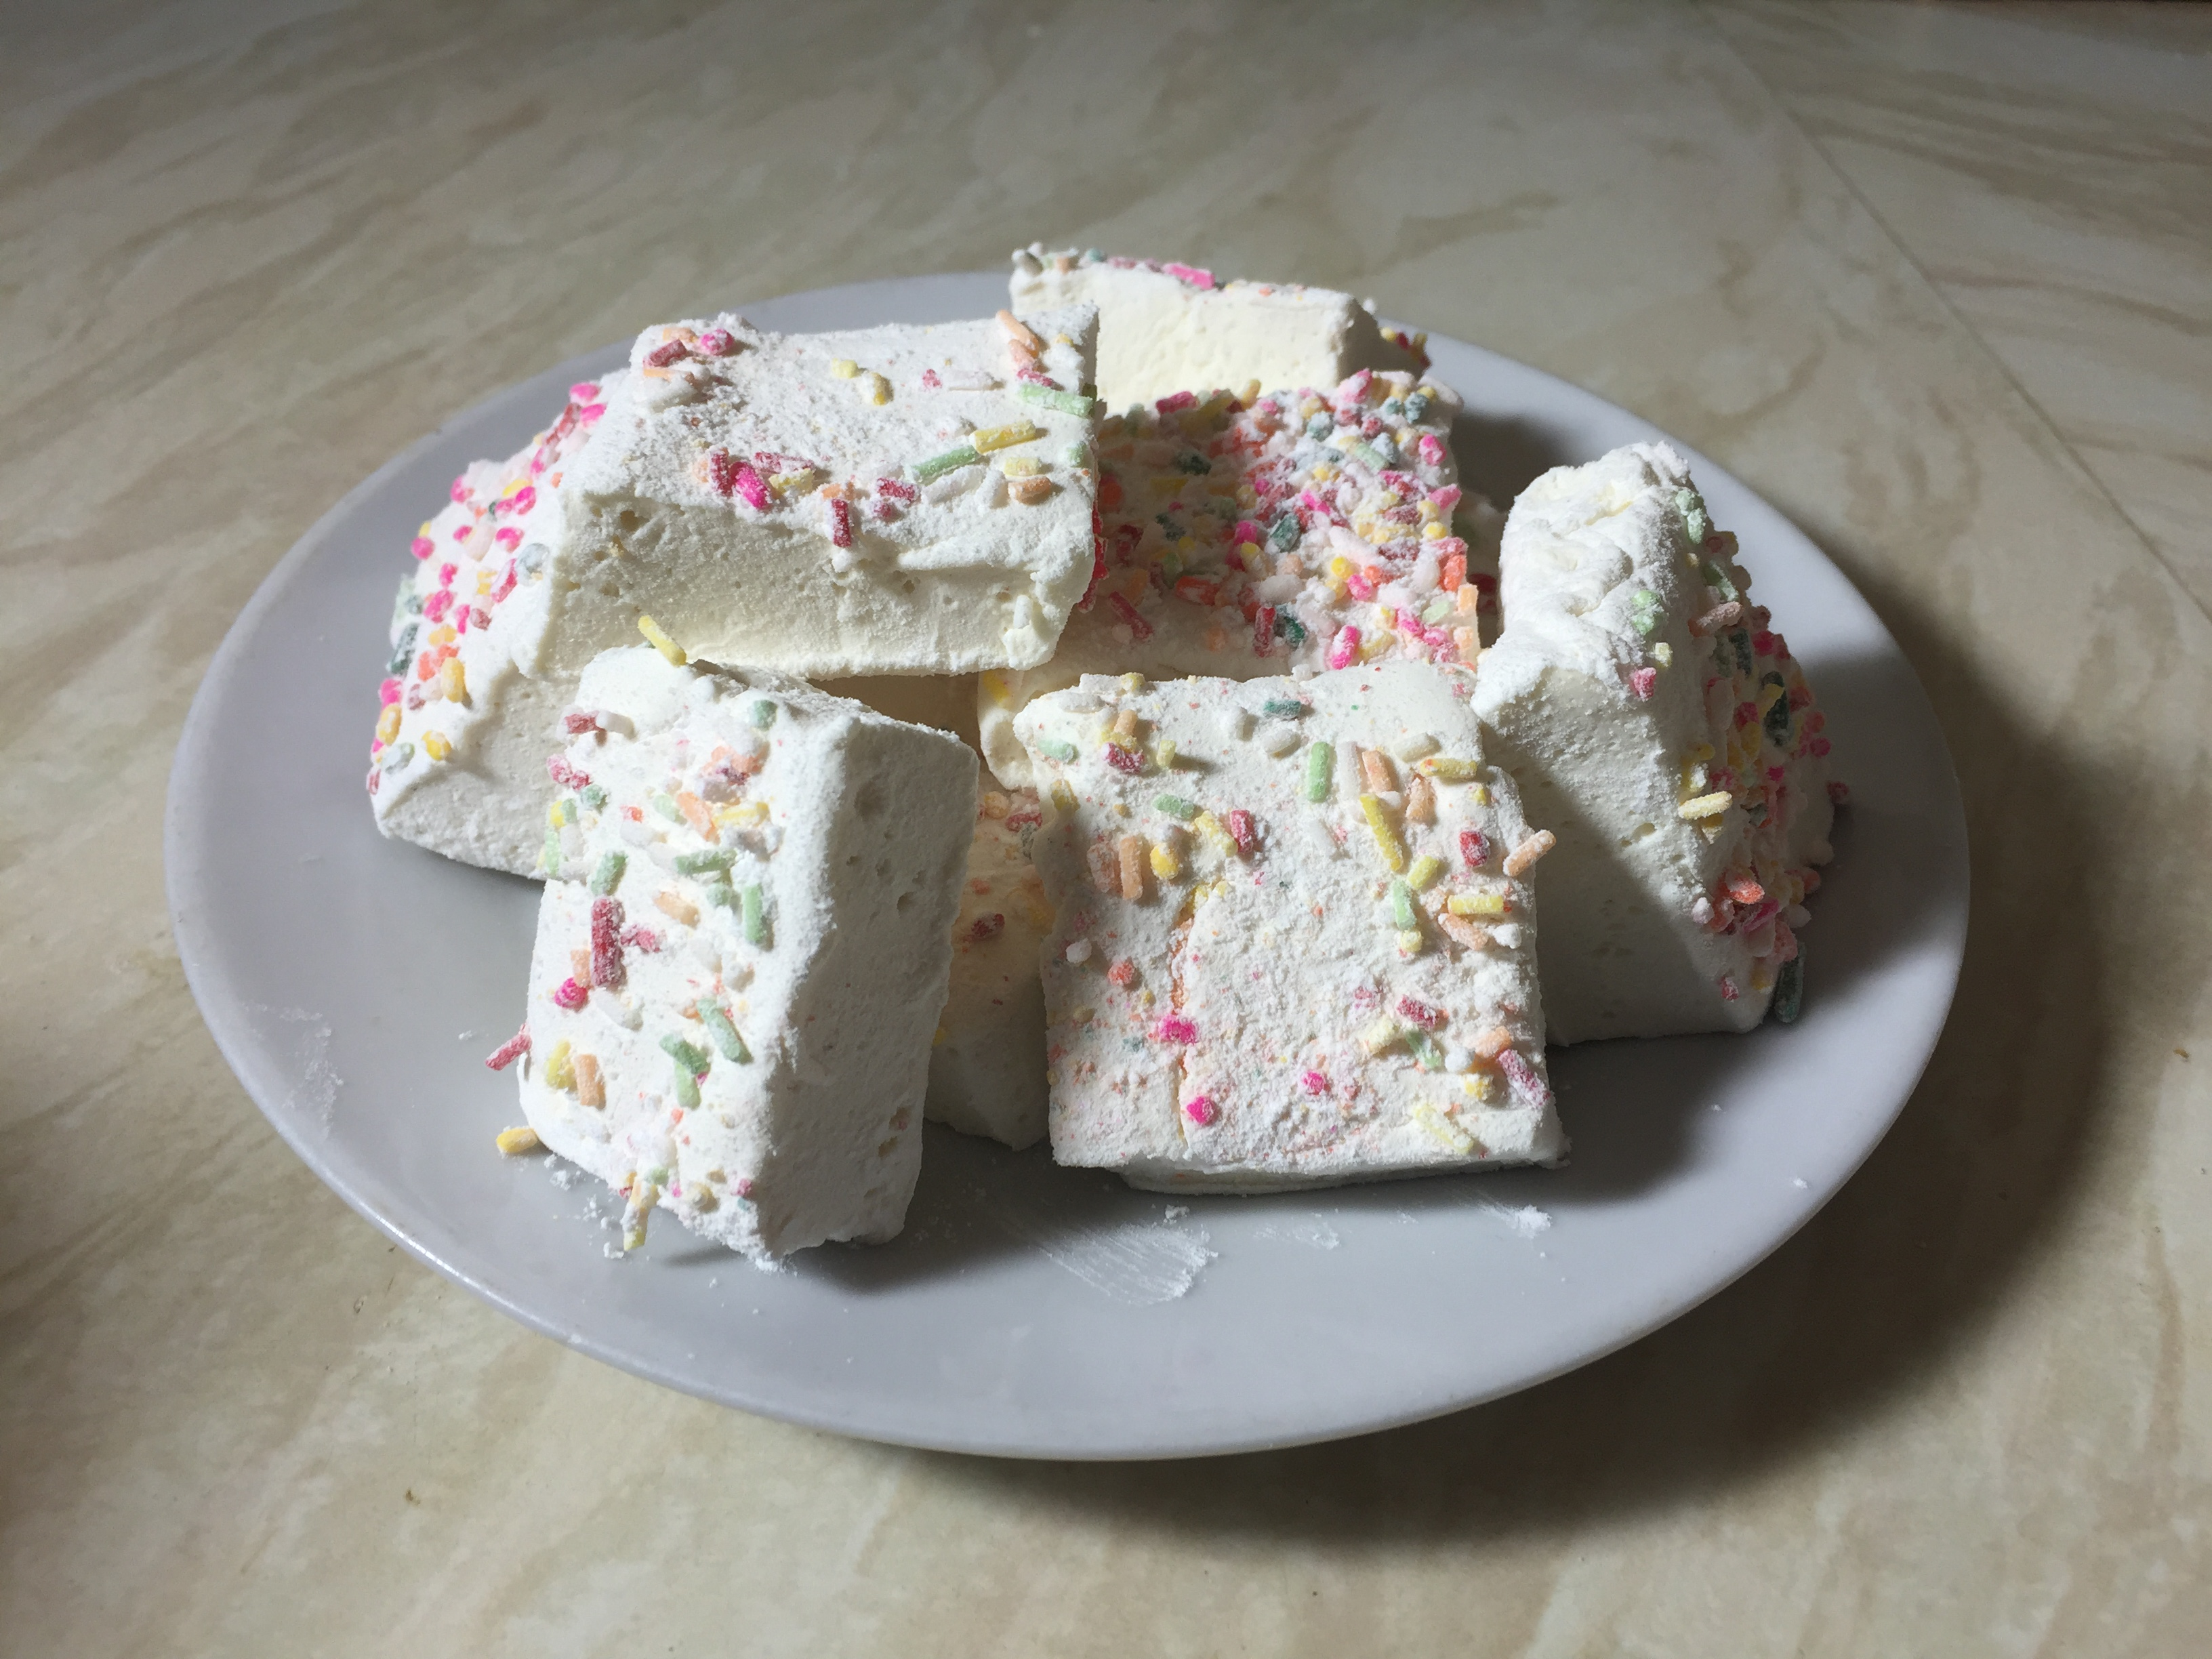 Bubblegum flavour marshmallow recipe - foodie flavours